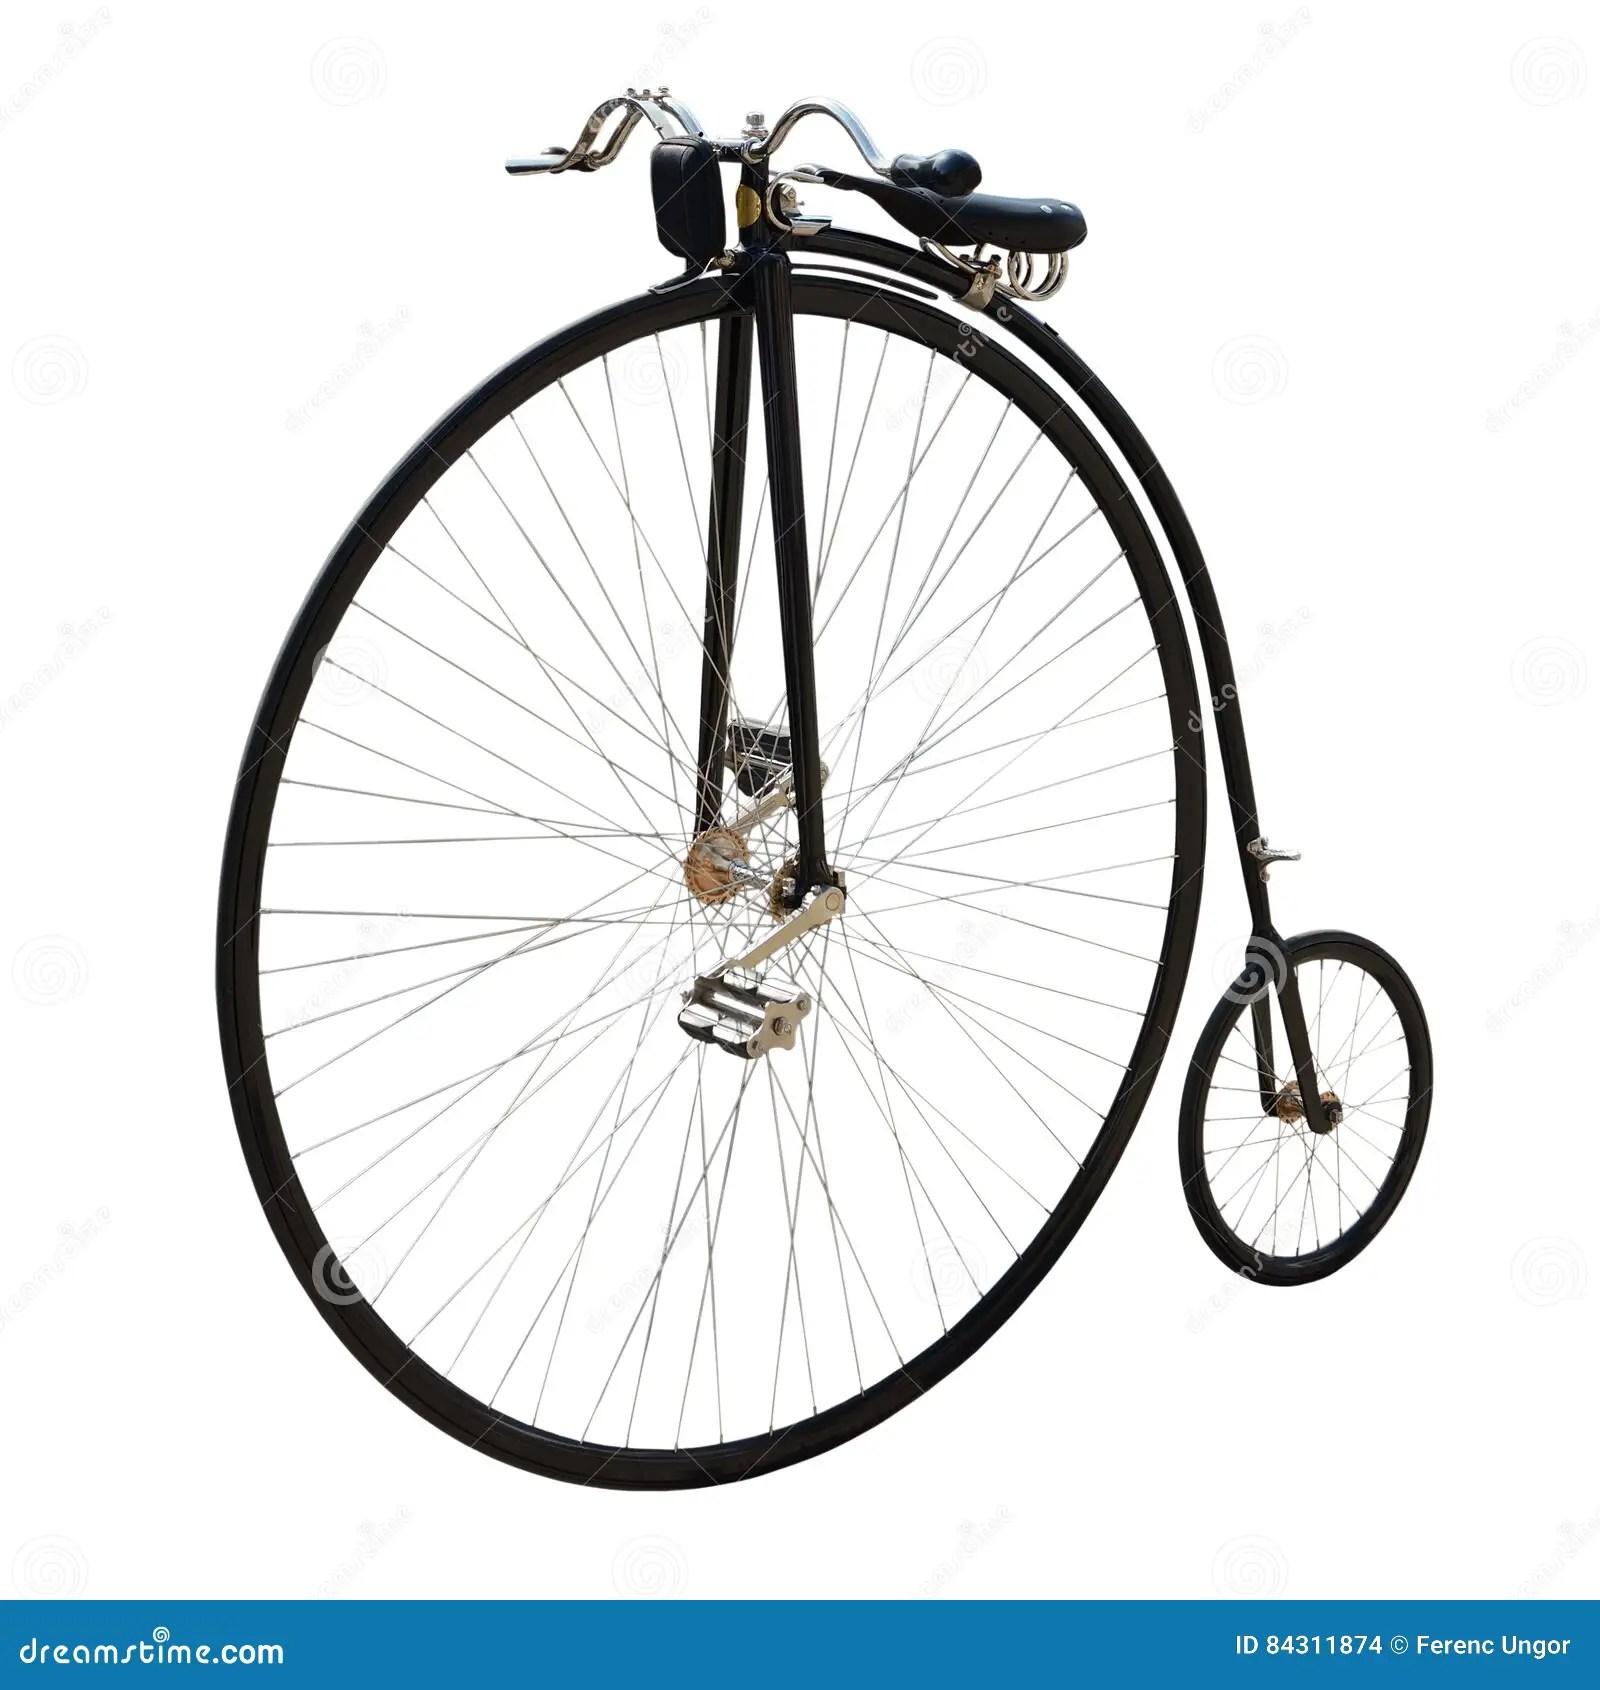 bike back tire diagram